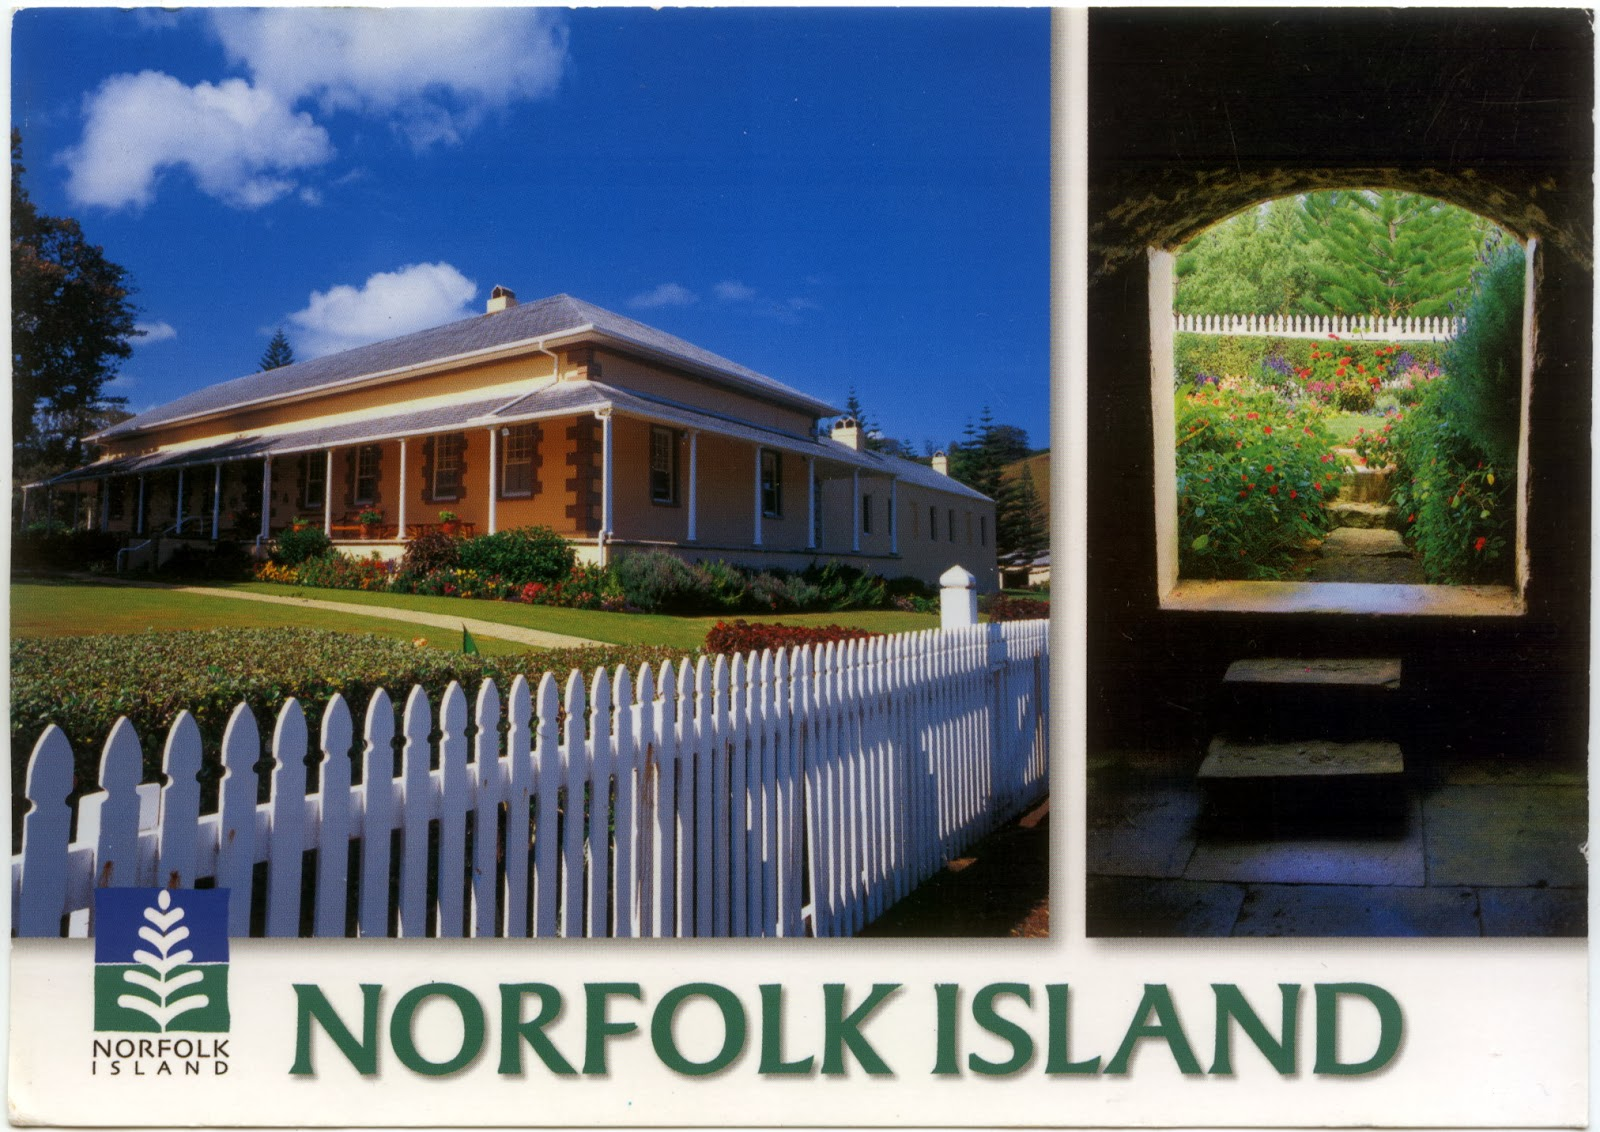 norfolk island phone book october 2015